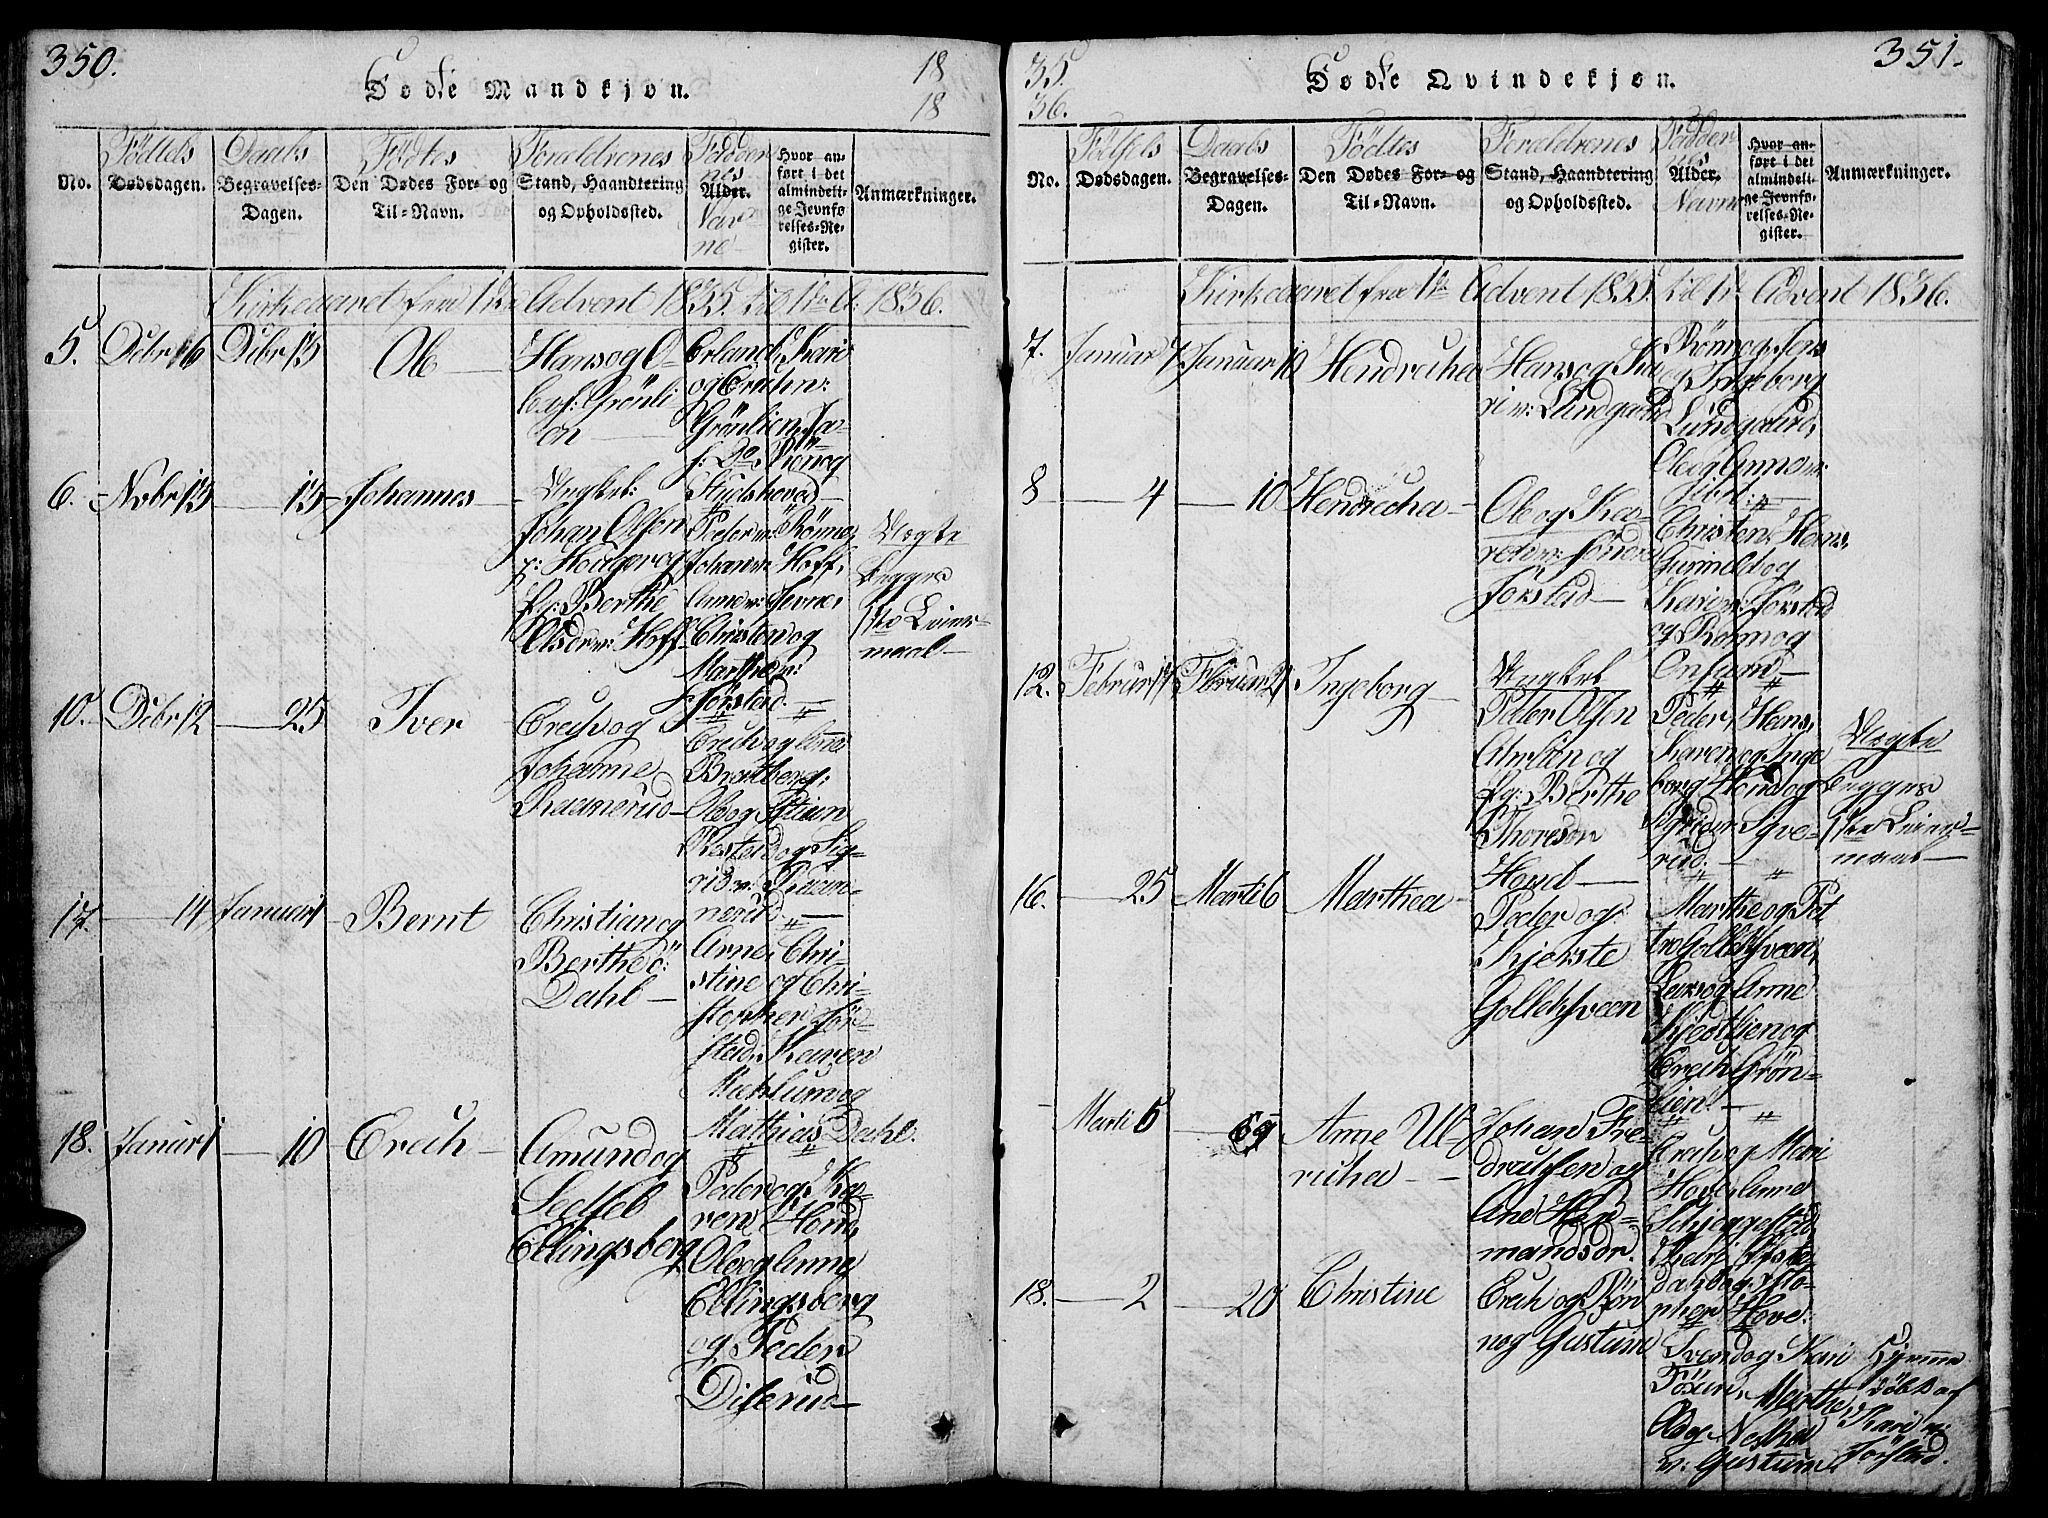 SAH, Fåberg prestekontor, Klokkerbok nr. 4, 1818-1837, s. 350-351